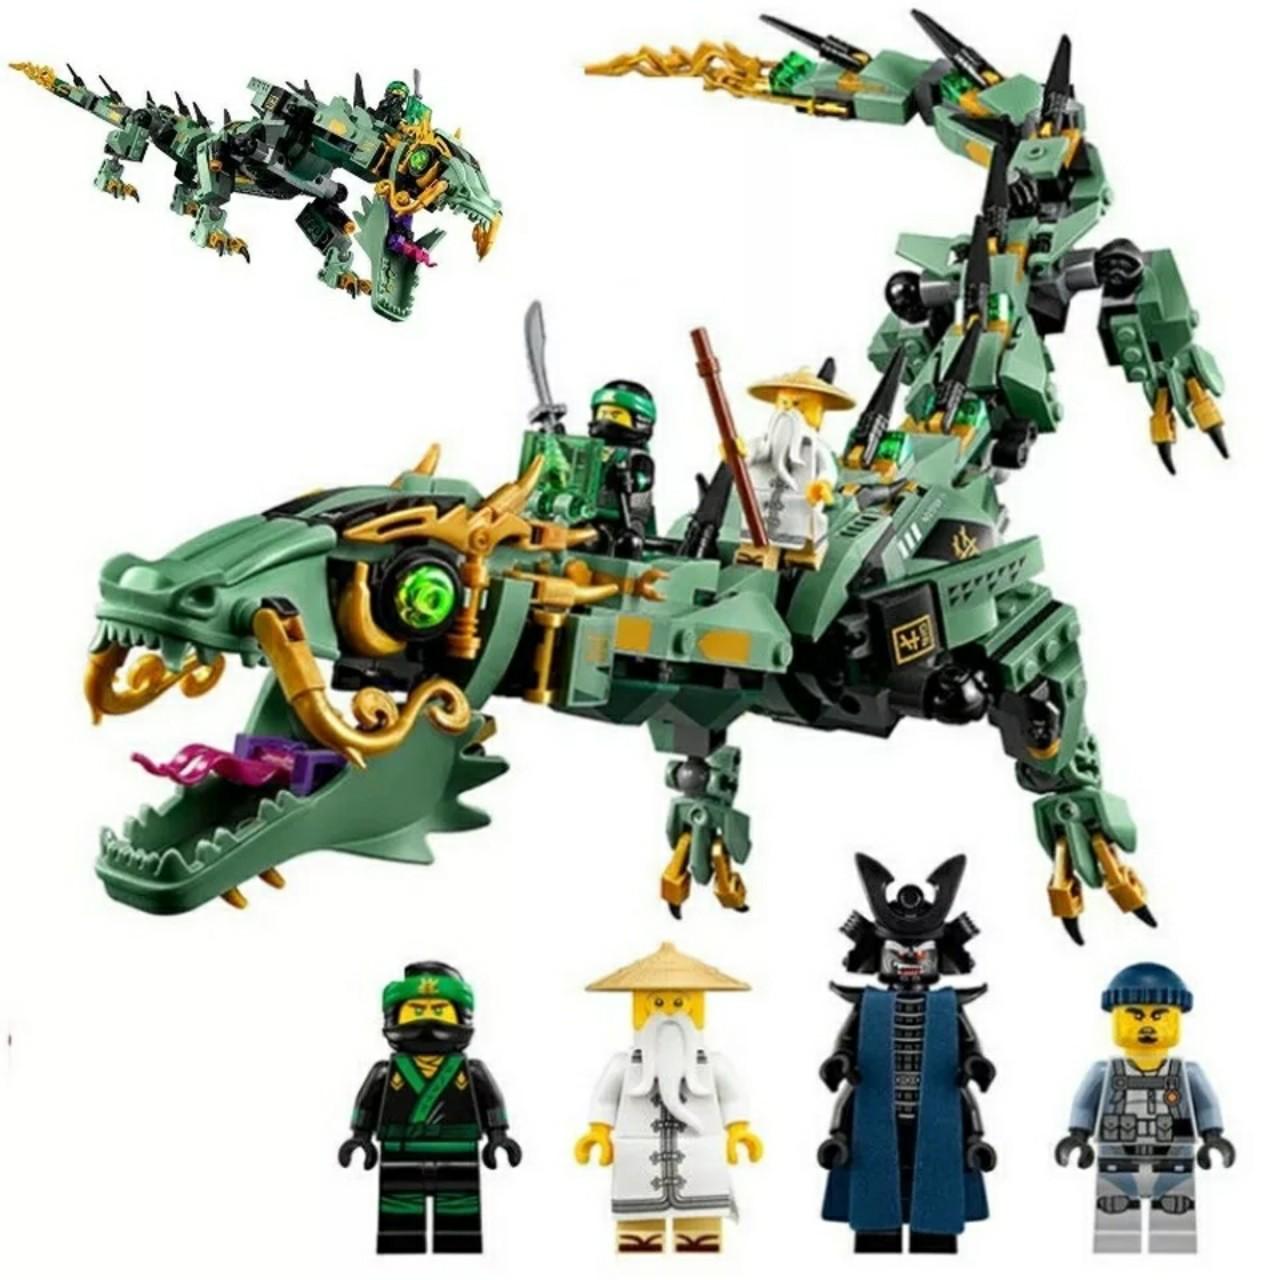 LEGO NINJAGO rồng xanh của NINJA 575 miếng ghép - LEDUO 76053